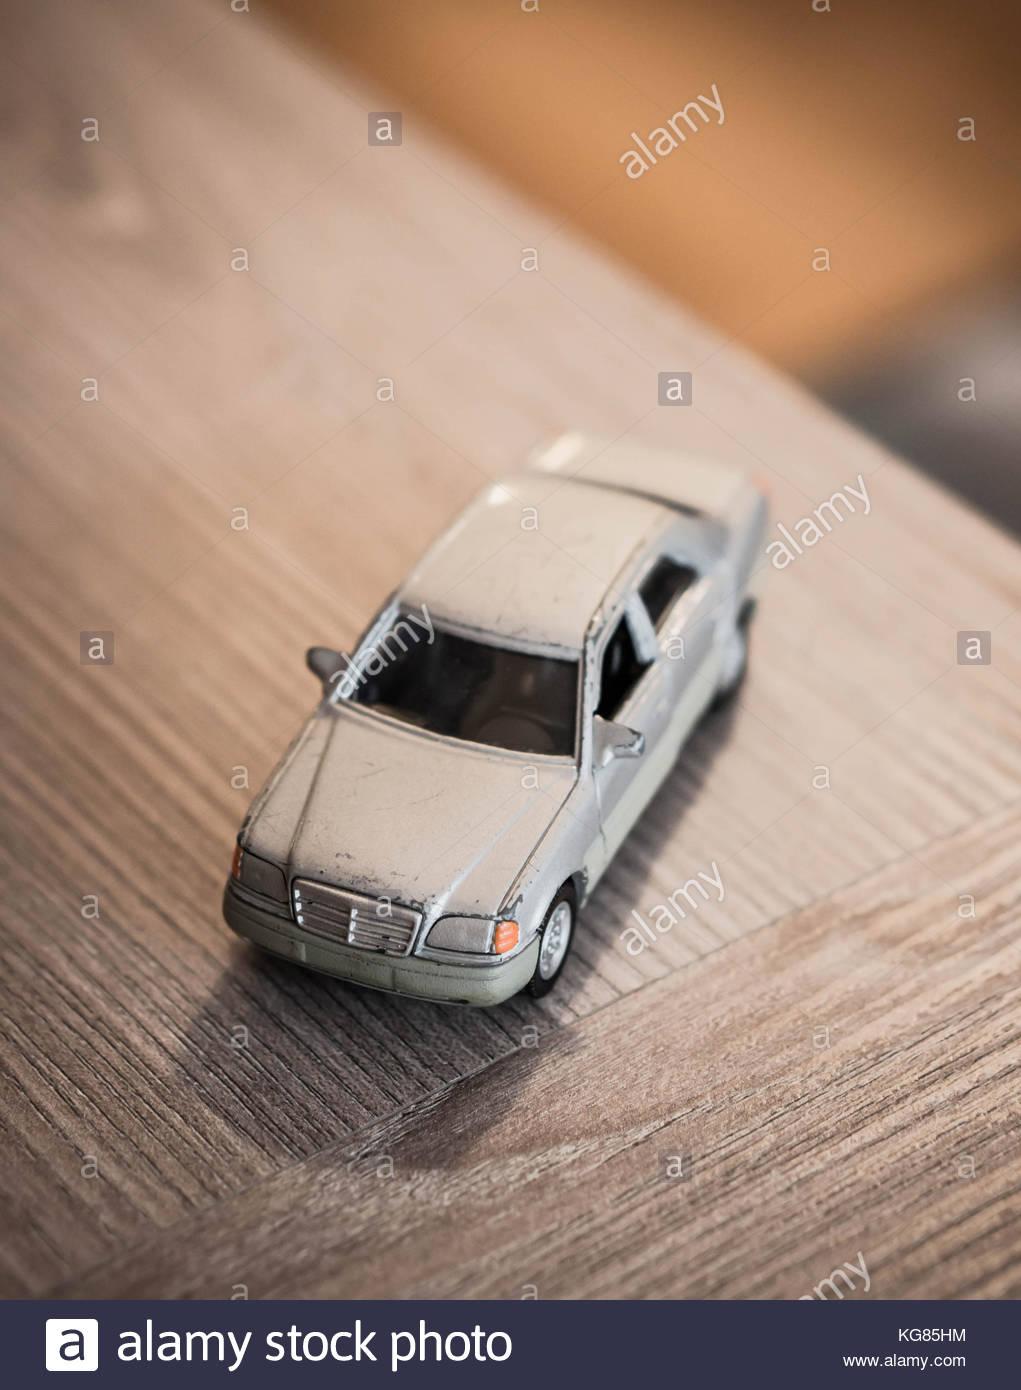 Photosamp; Model Benz Toy Car Mercedes m8n0yNOPvw